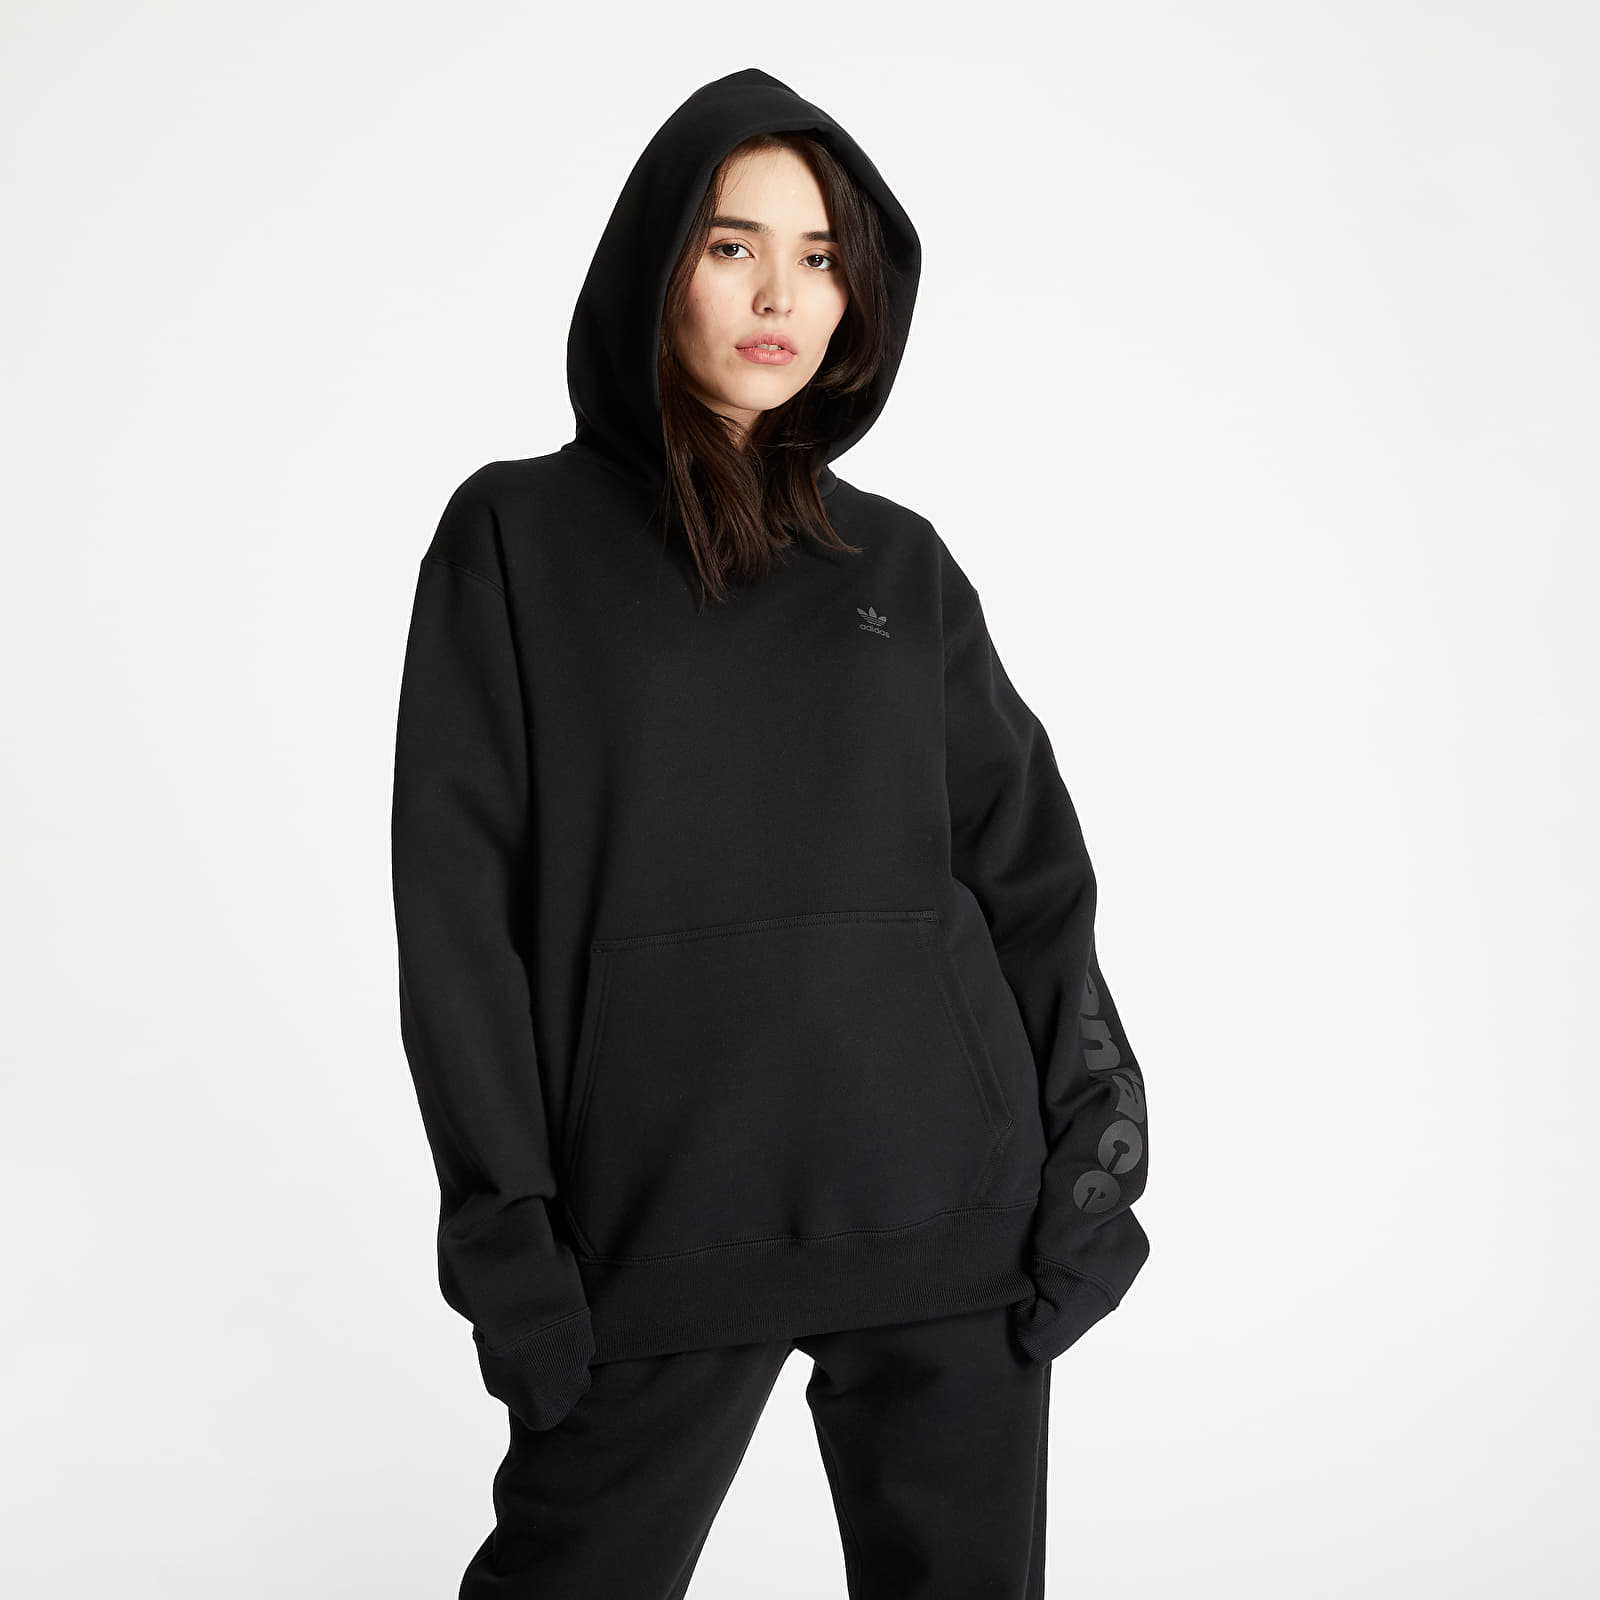 adidas x Pharrell Williams Premium Basics Hoodie Black EUR XXS